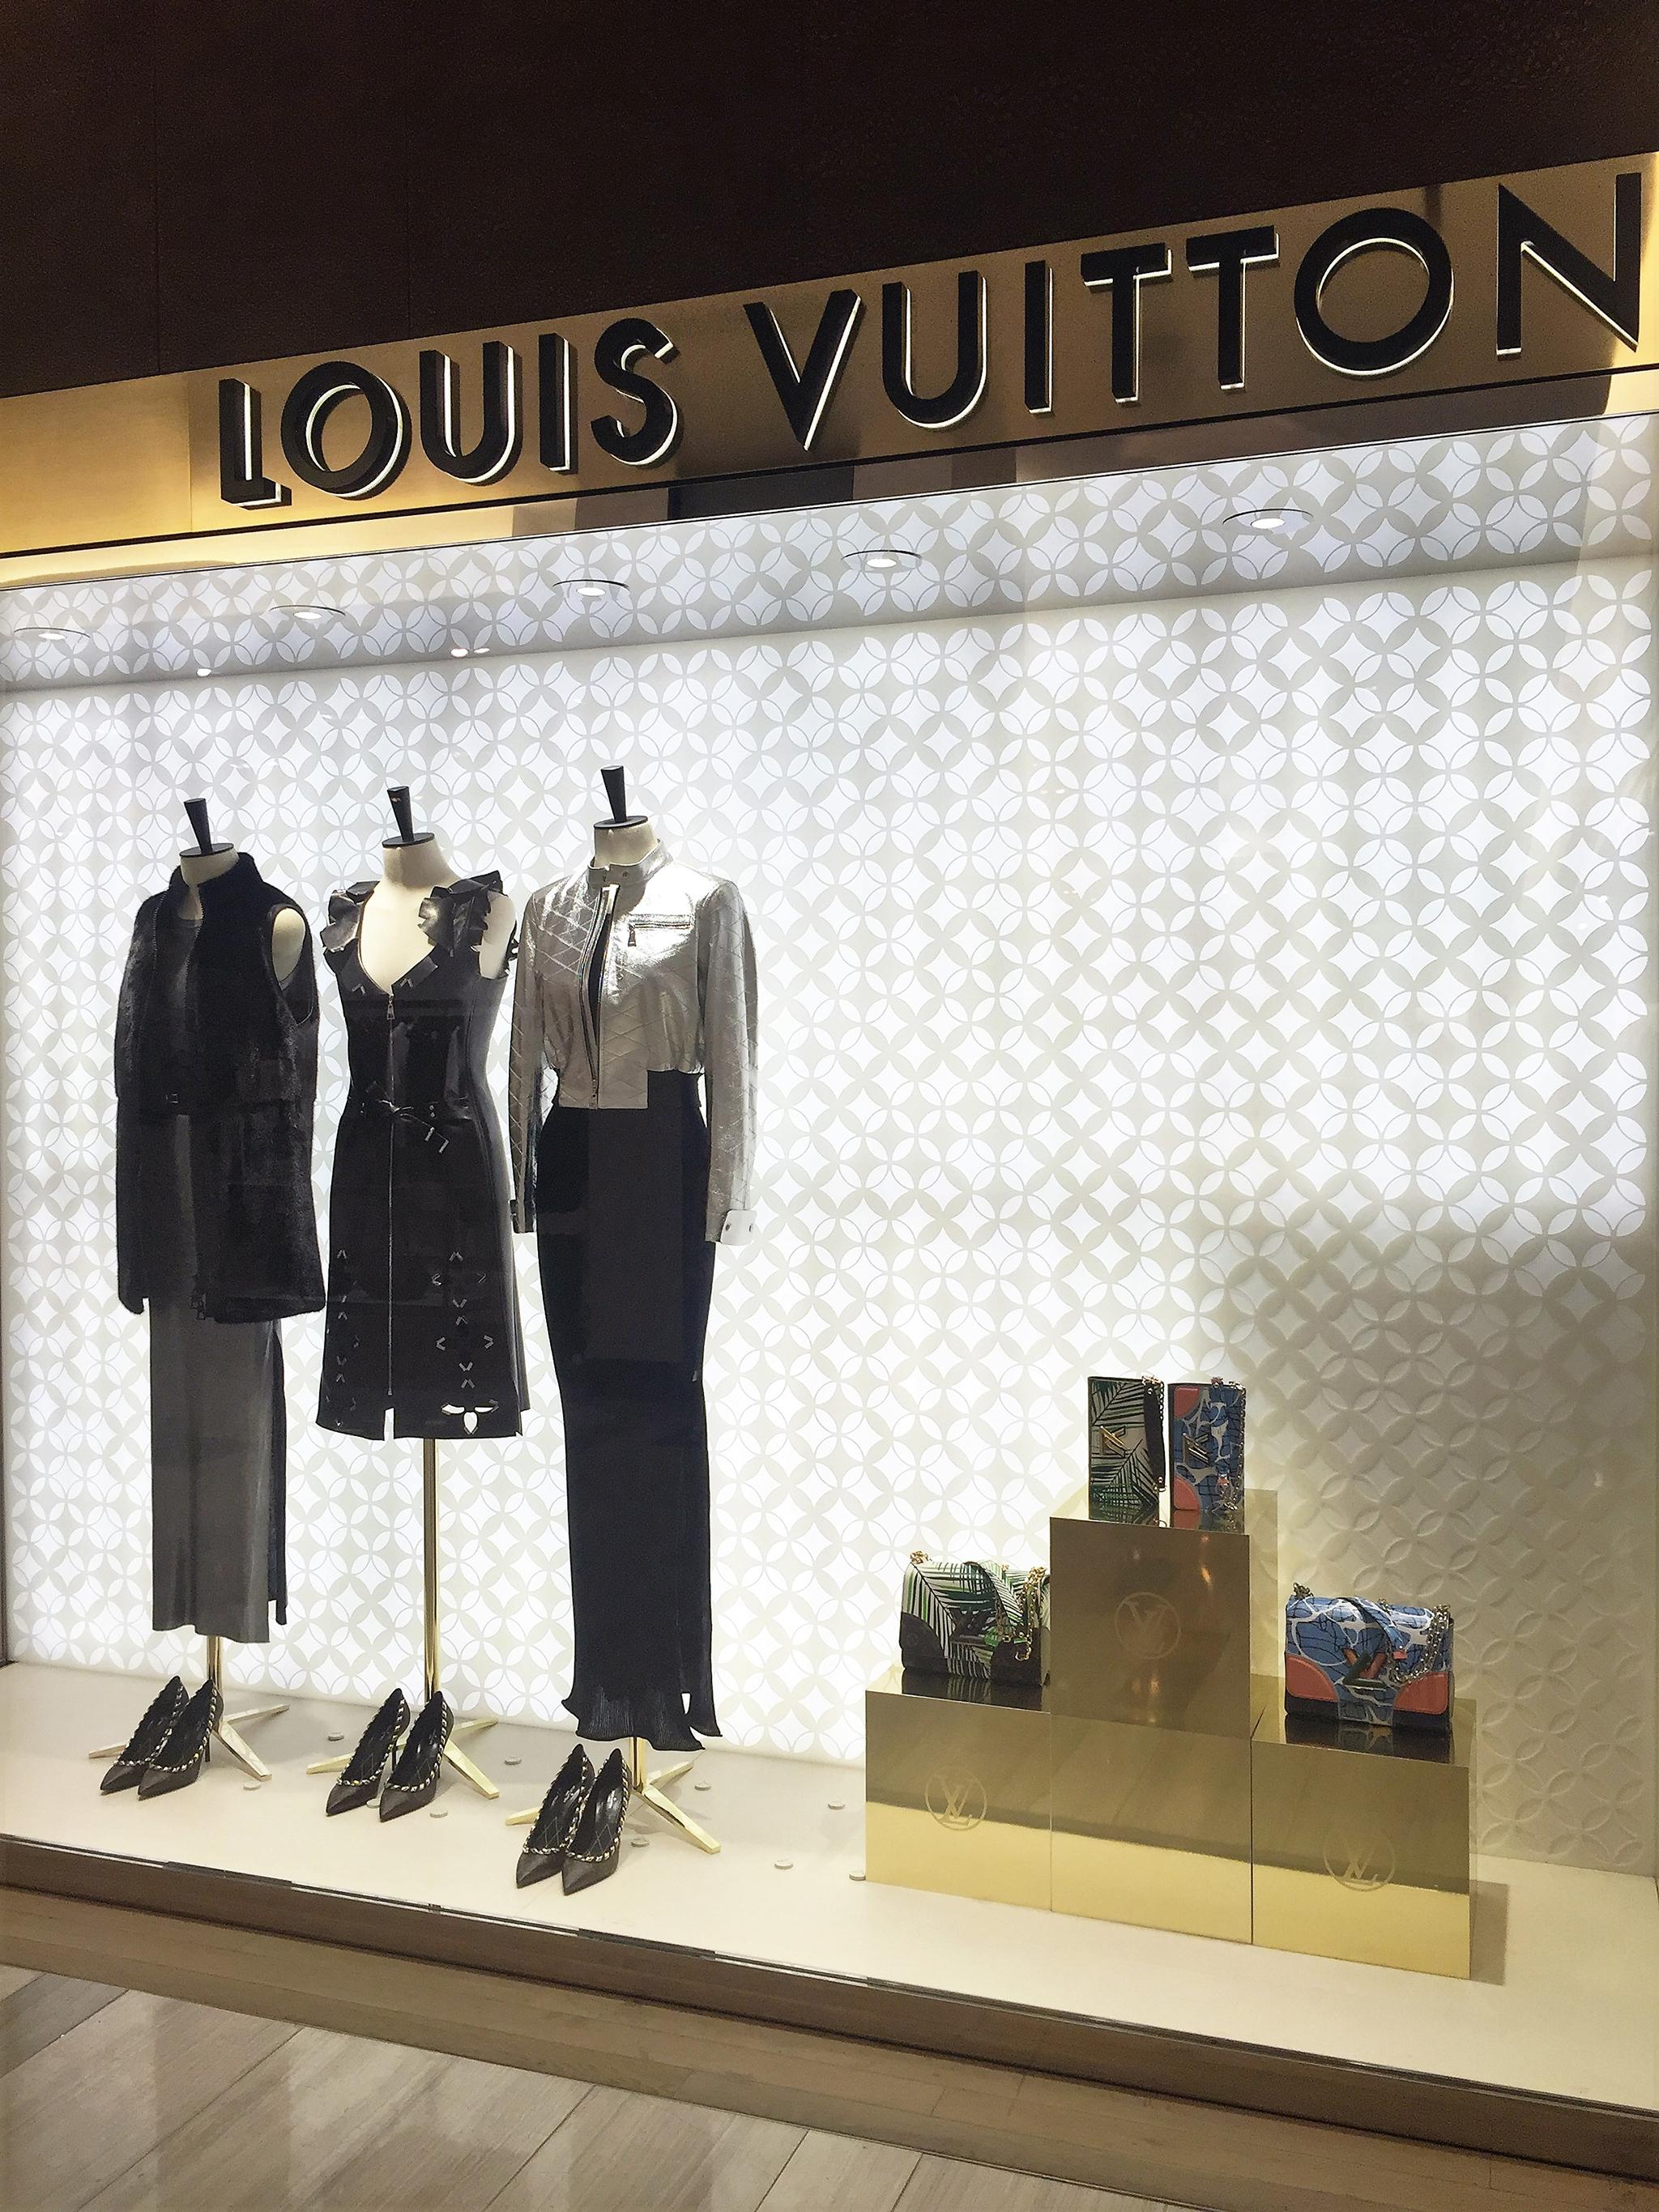 Louis-Vuitton-Saks-5th-Ave-01